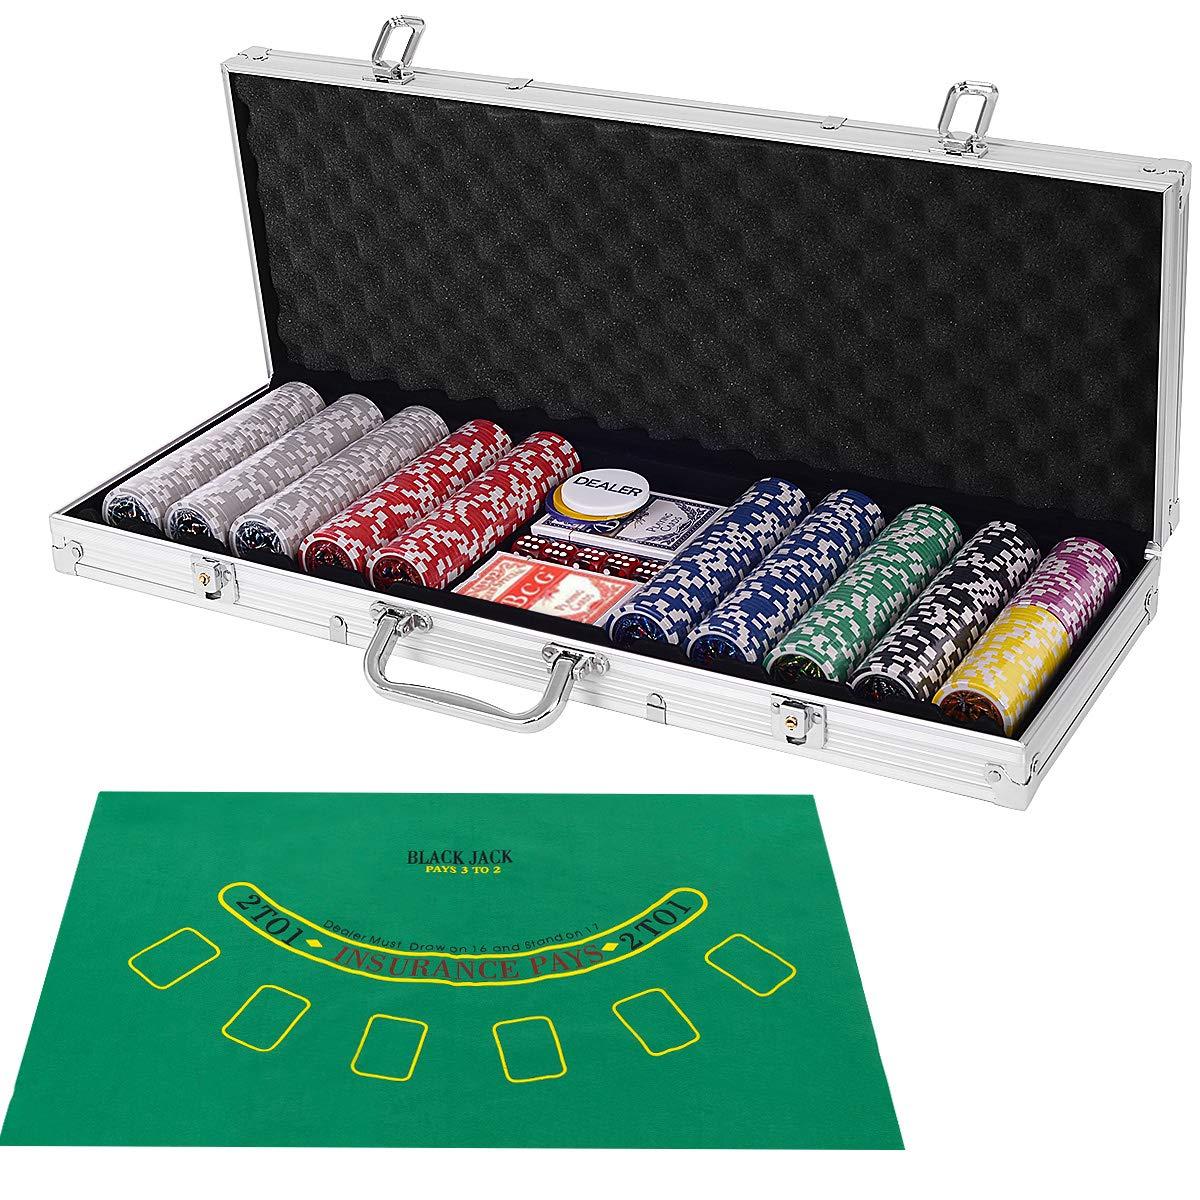 costzonポーカーチップのセット500、11.5グラムのアルミケース付き、5ダイスチップ、2 Decks Playing Silver Case Cards Playing、ディーラーボタン、レイアウト シルバー Silver Case B072XBB94J, かぎの蔵屋:a8f65cd5 --- 2017.goldenesbrett.net